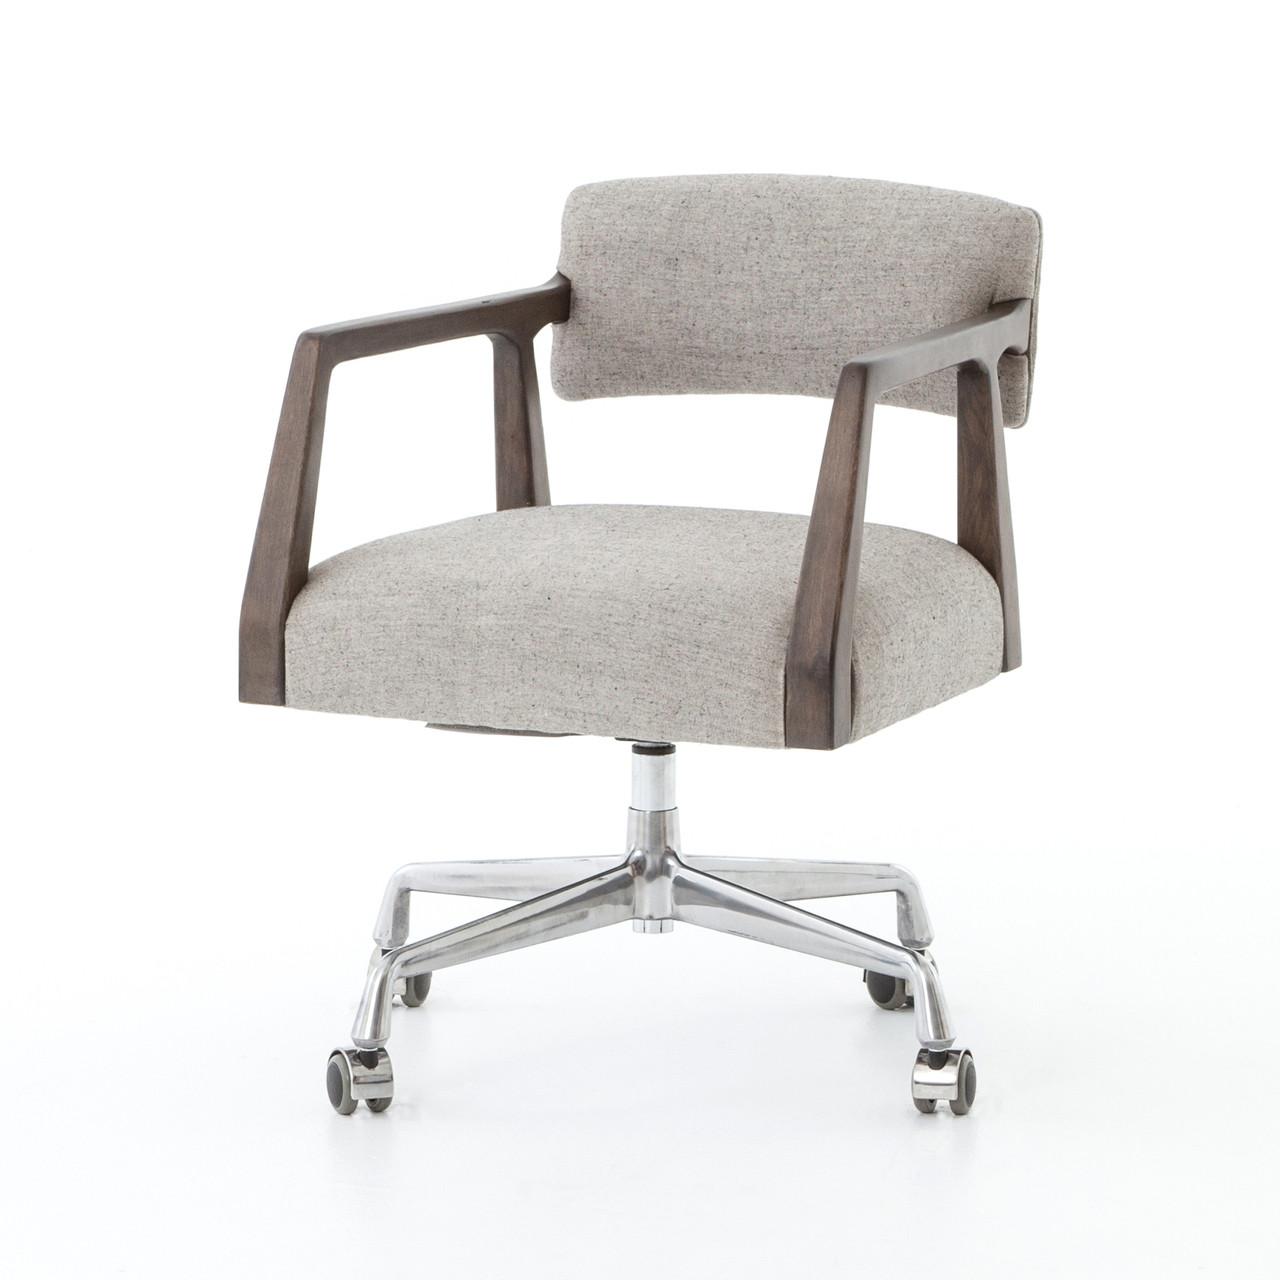 Marvelous Tyler Mid Century Modern Upholstered Office Desk Chair Download Free Architecture Designs Scobabritishbridgeorg